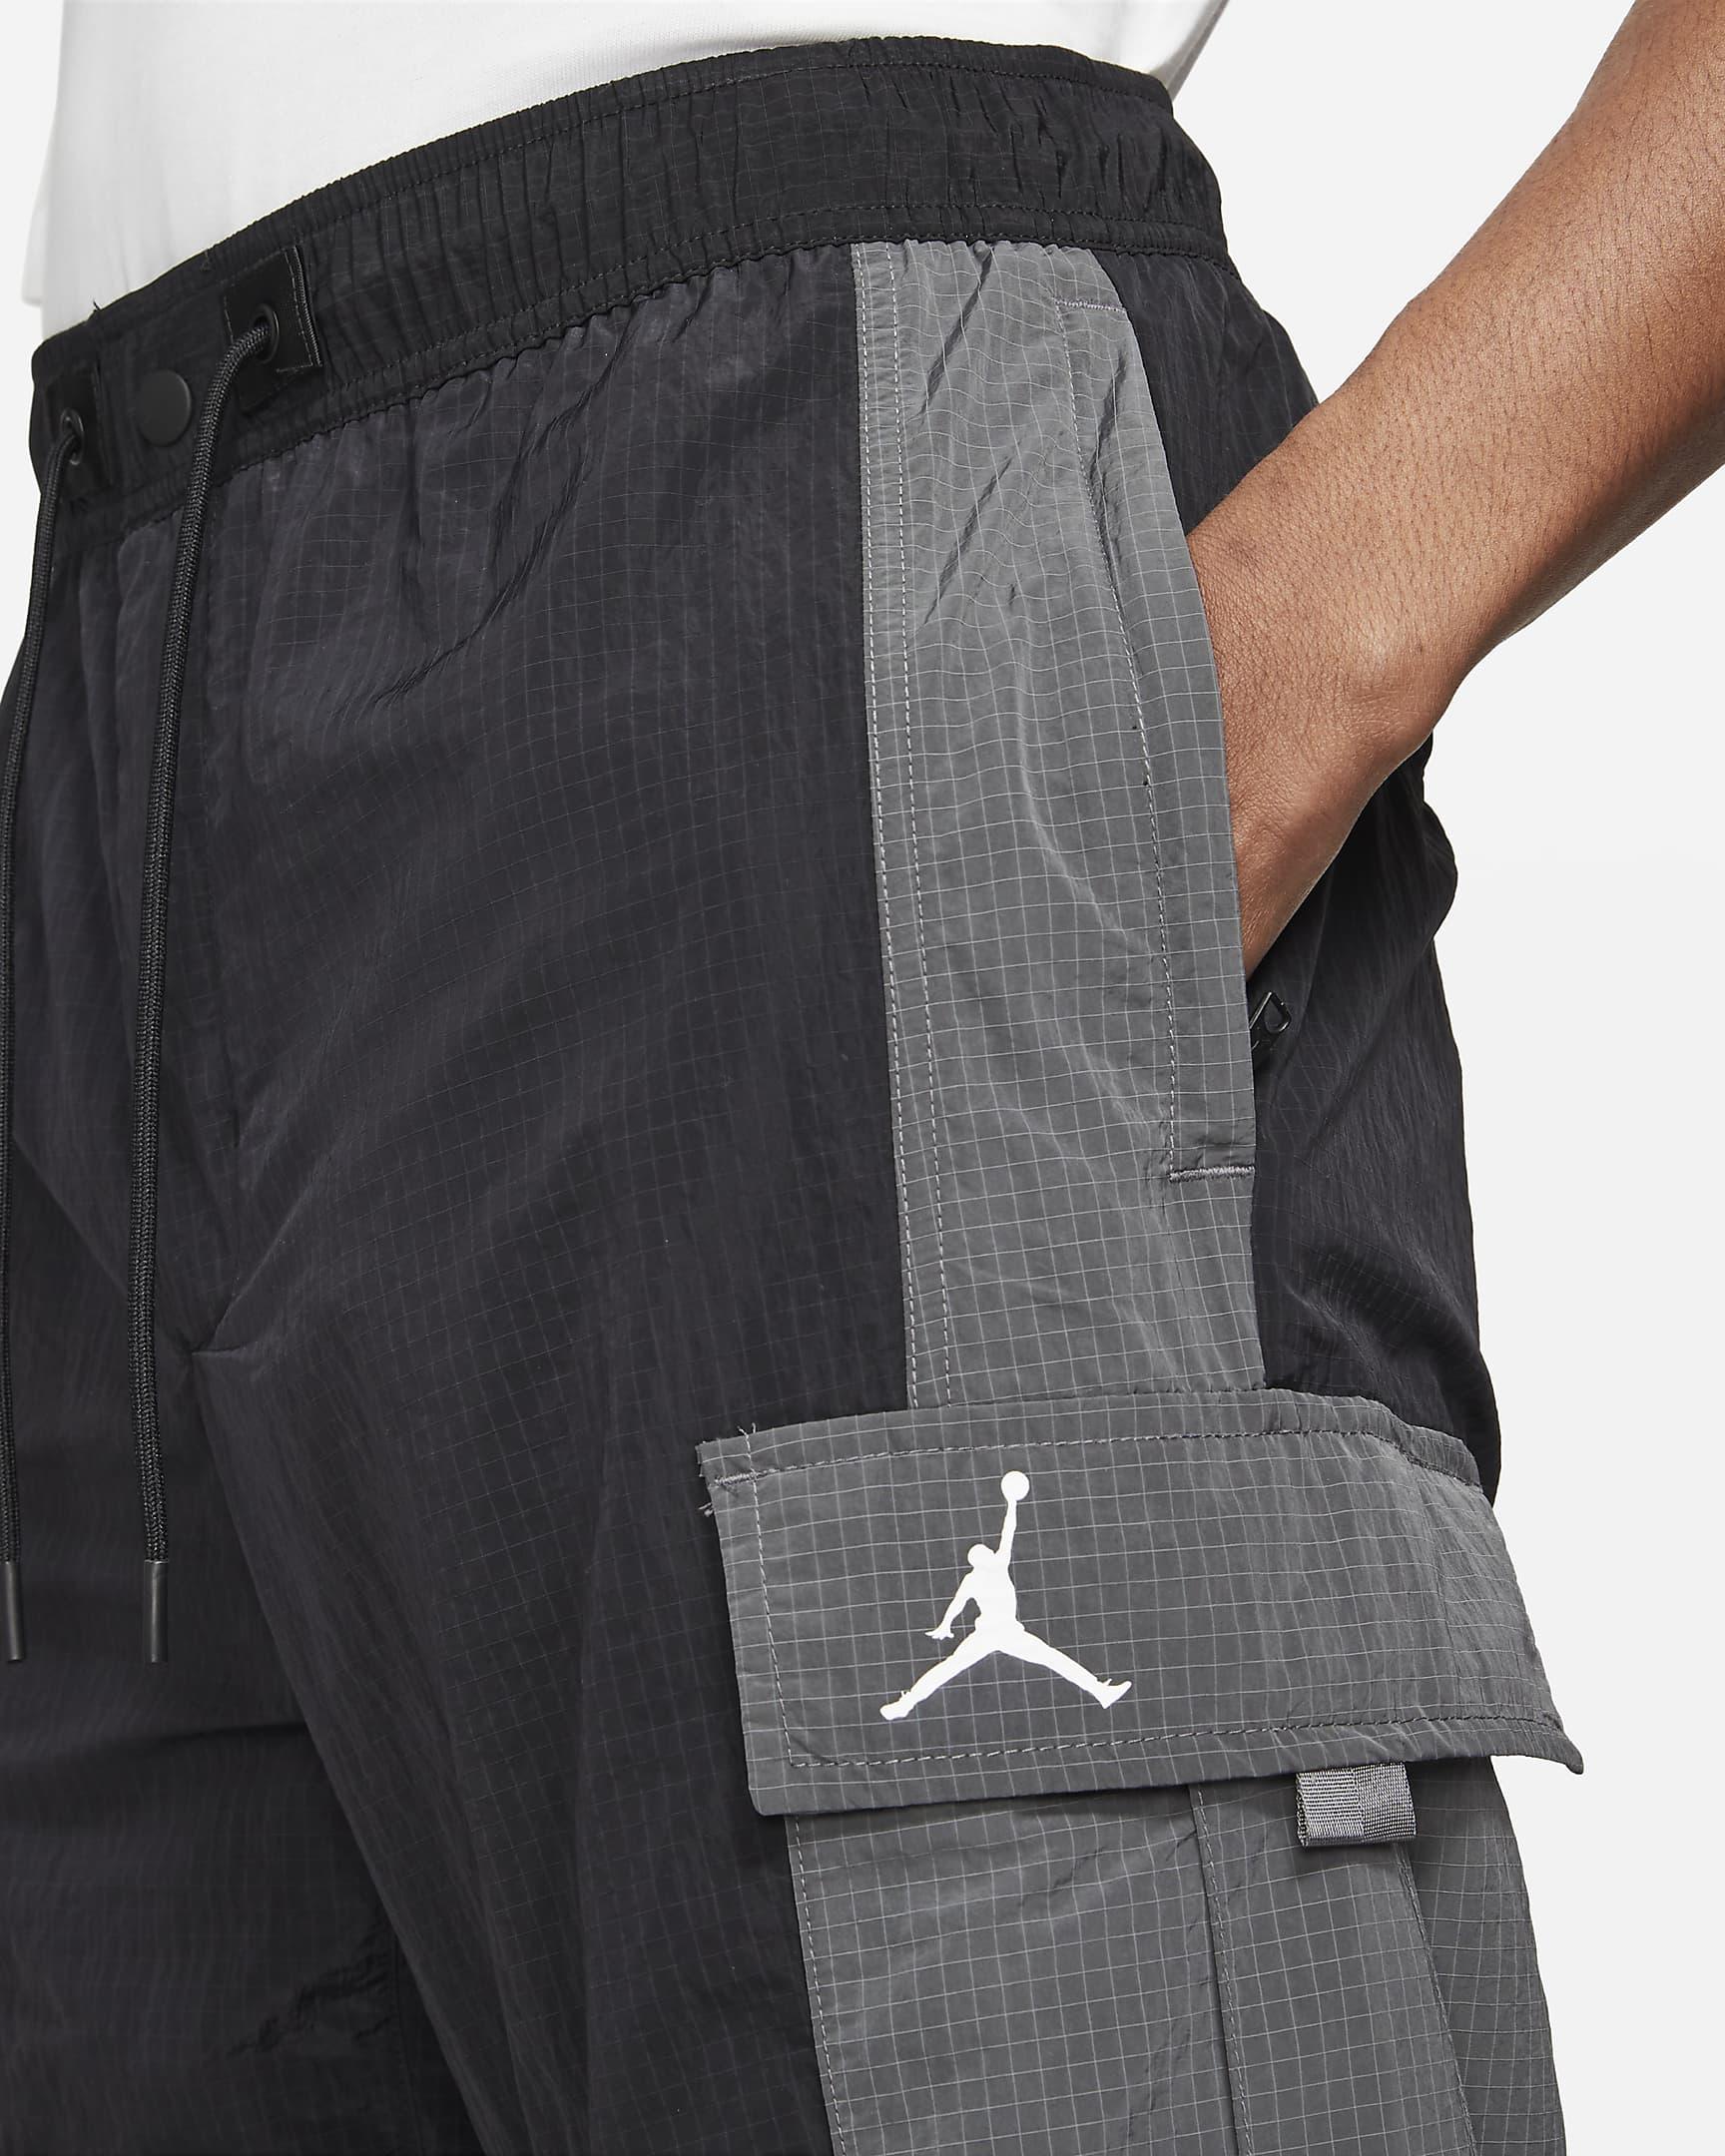 jordan-23-engineered-mens-woven-pants-dr02bG-2.png